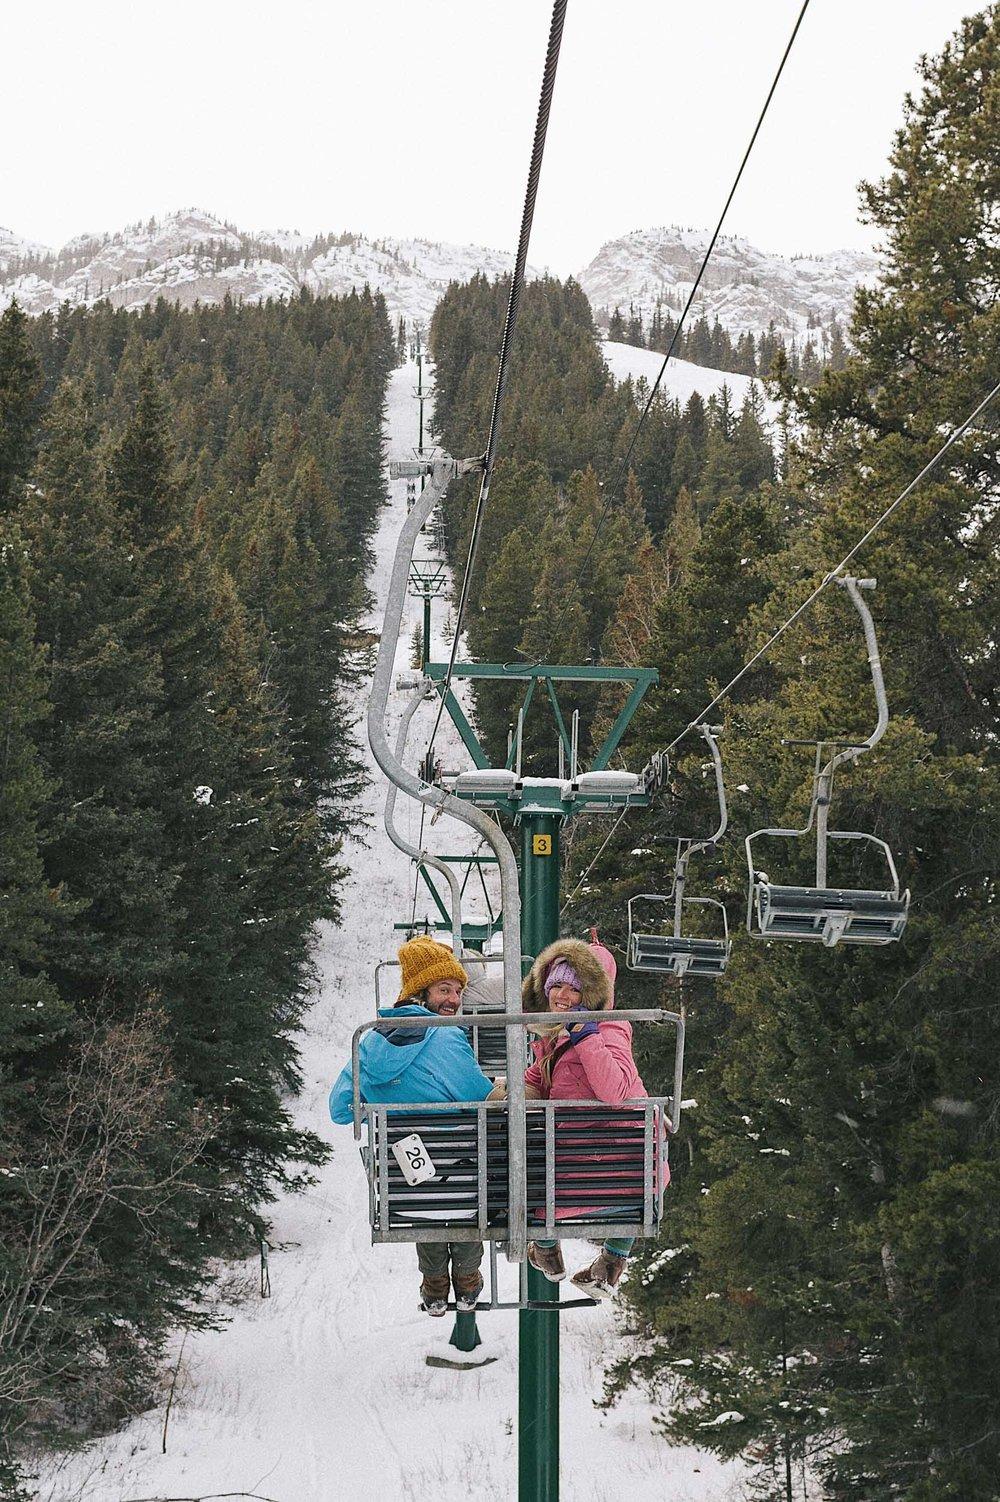 ckanani-banff-winter-a-guide-to-visiting-19.jpg